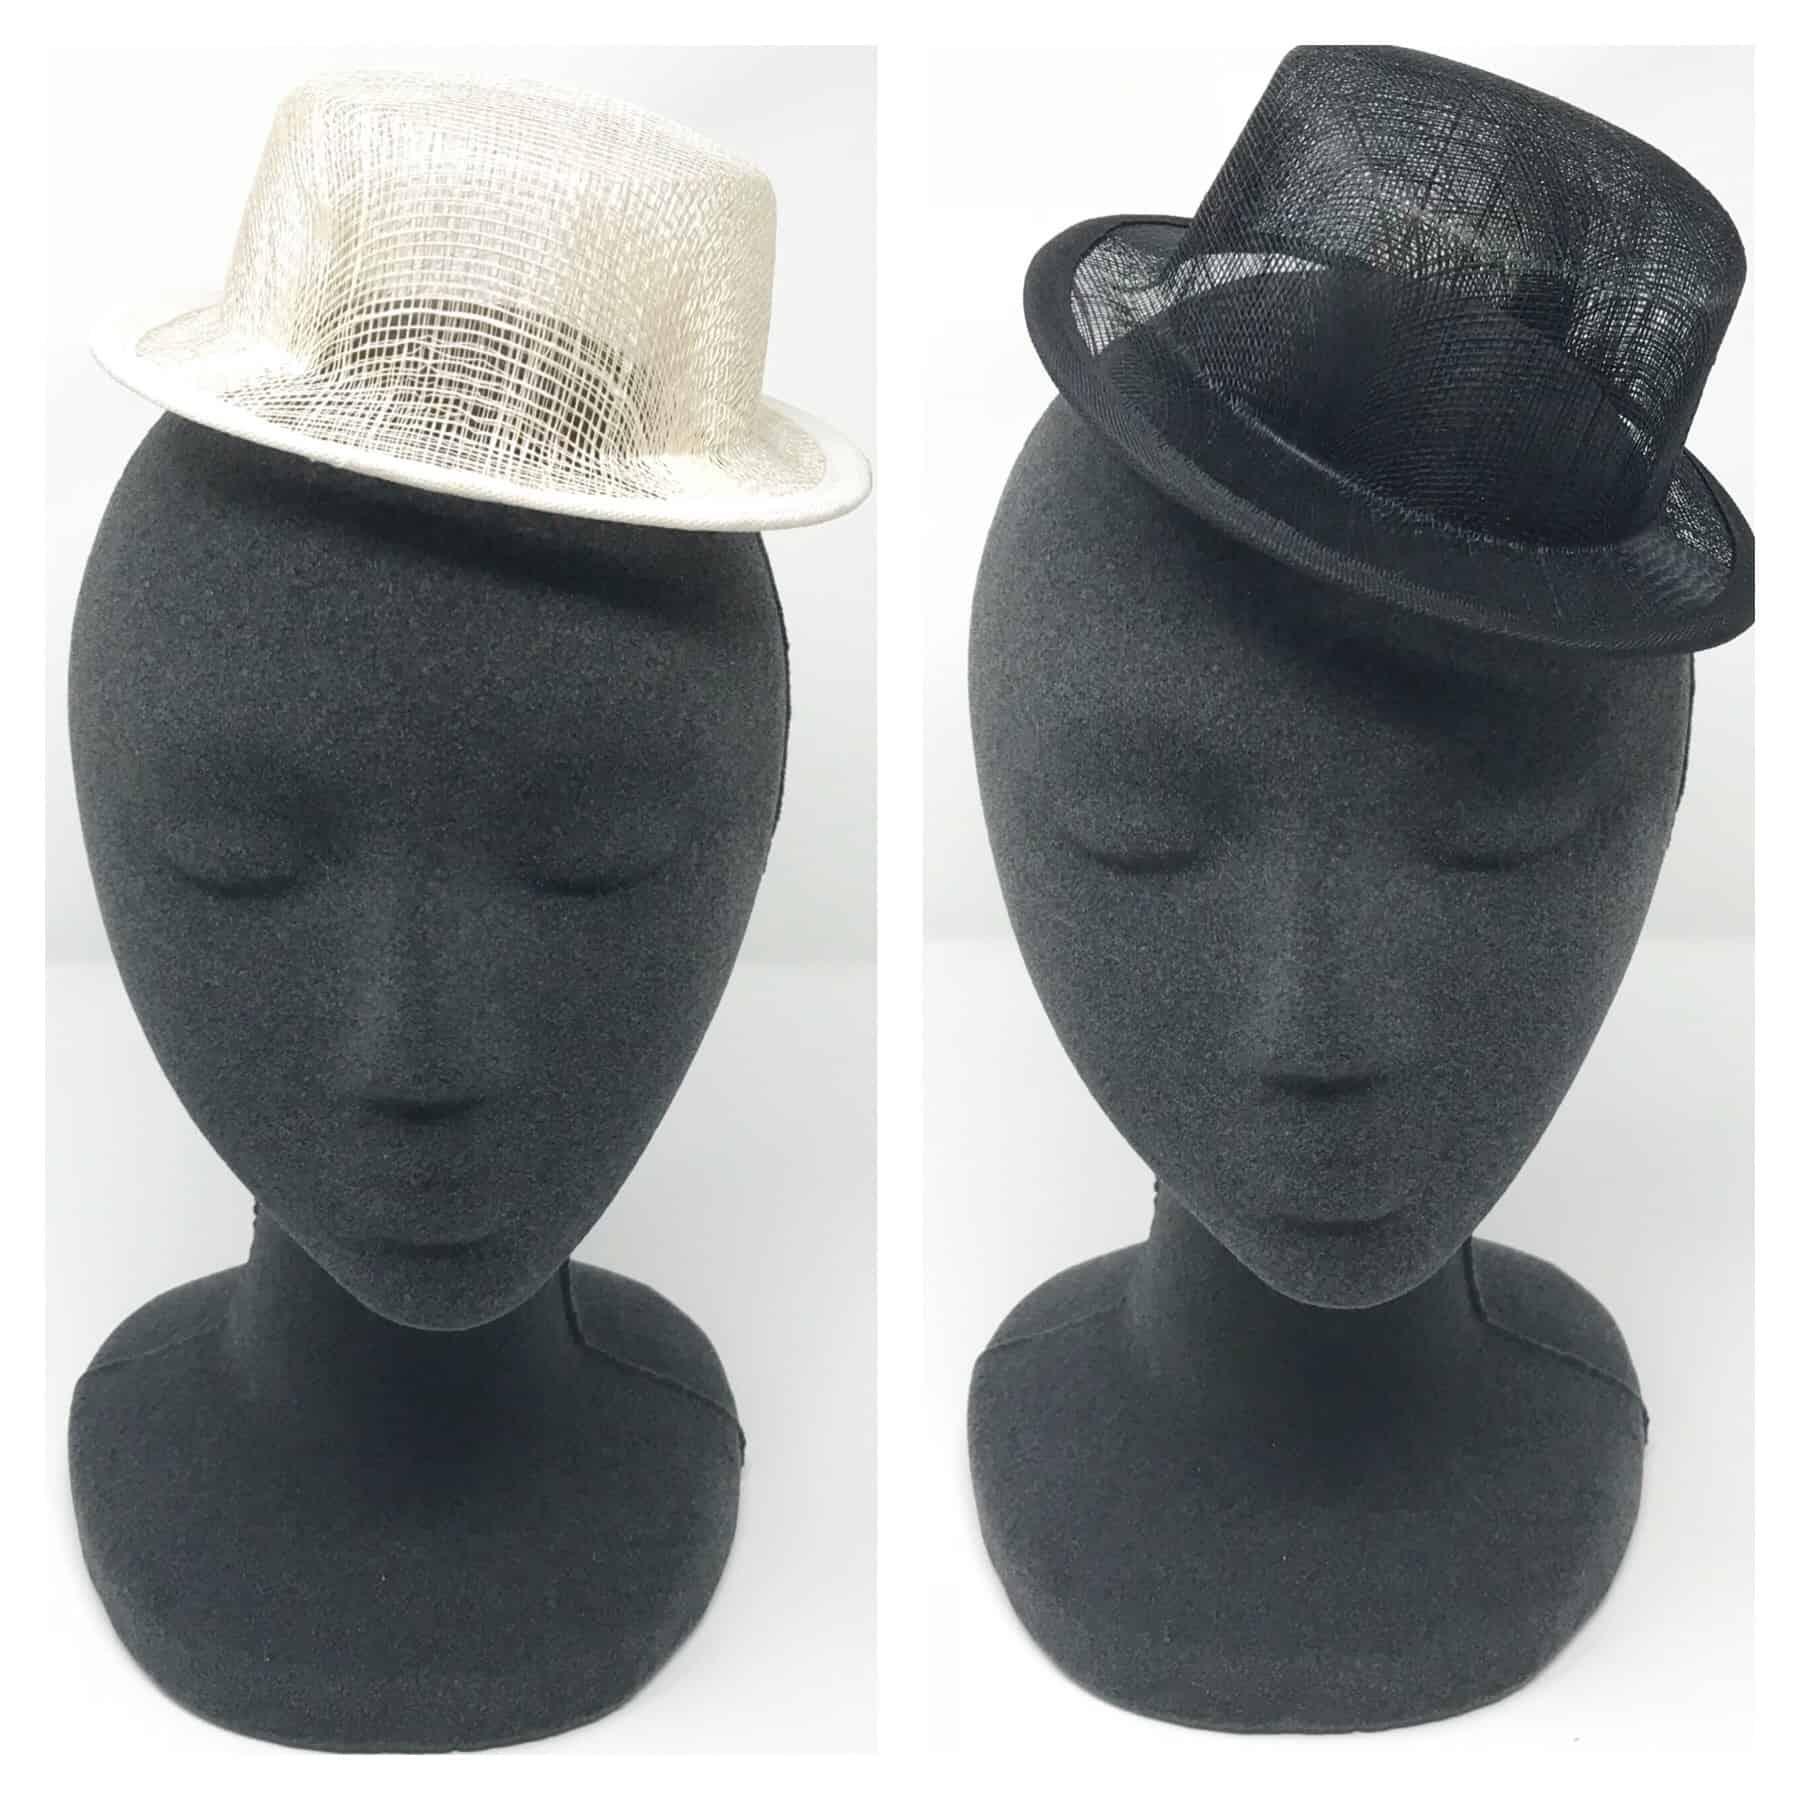 644a2473942 Sinamay Mini Top Hat - Shine Trim